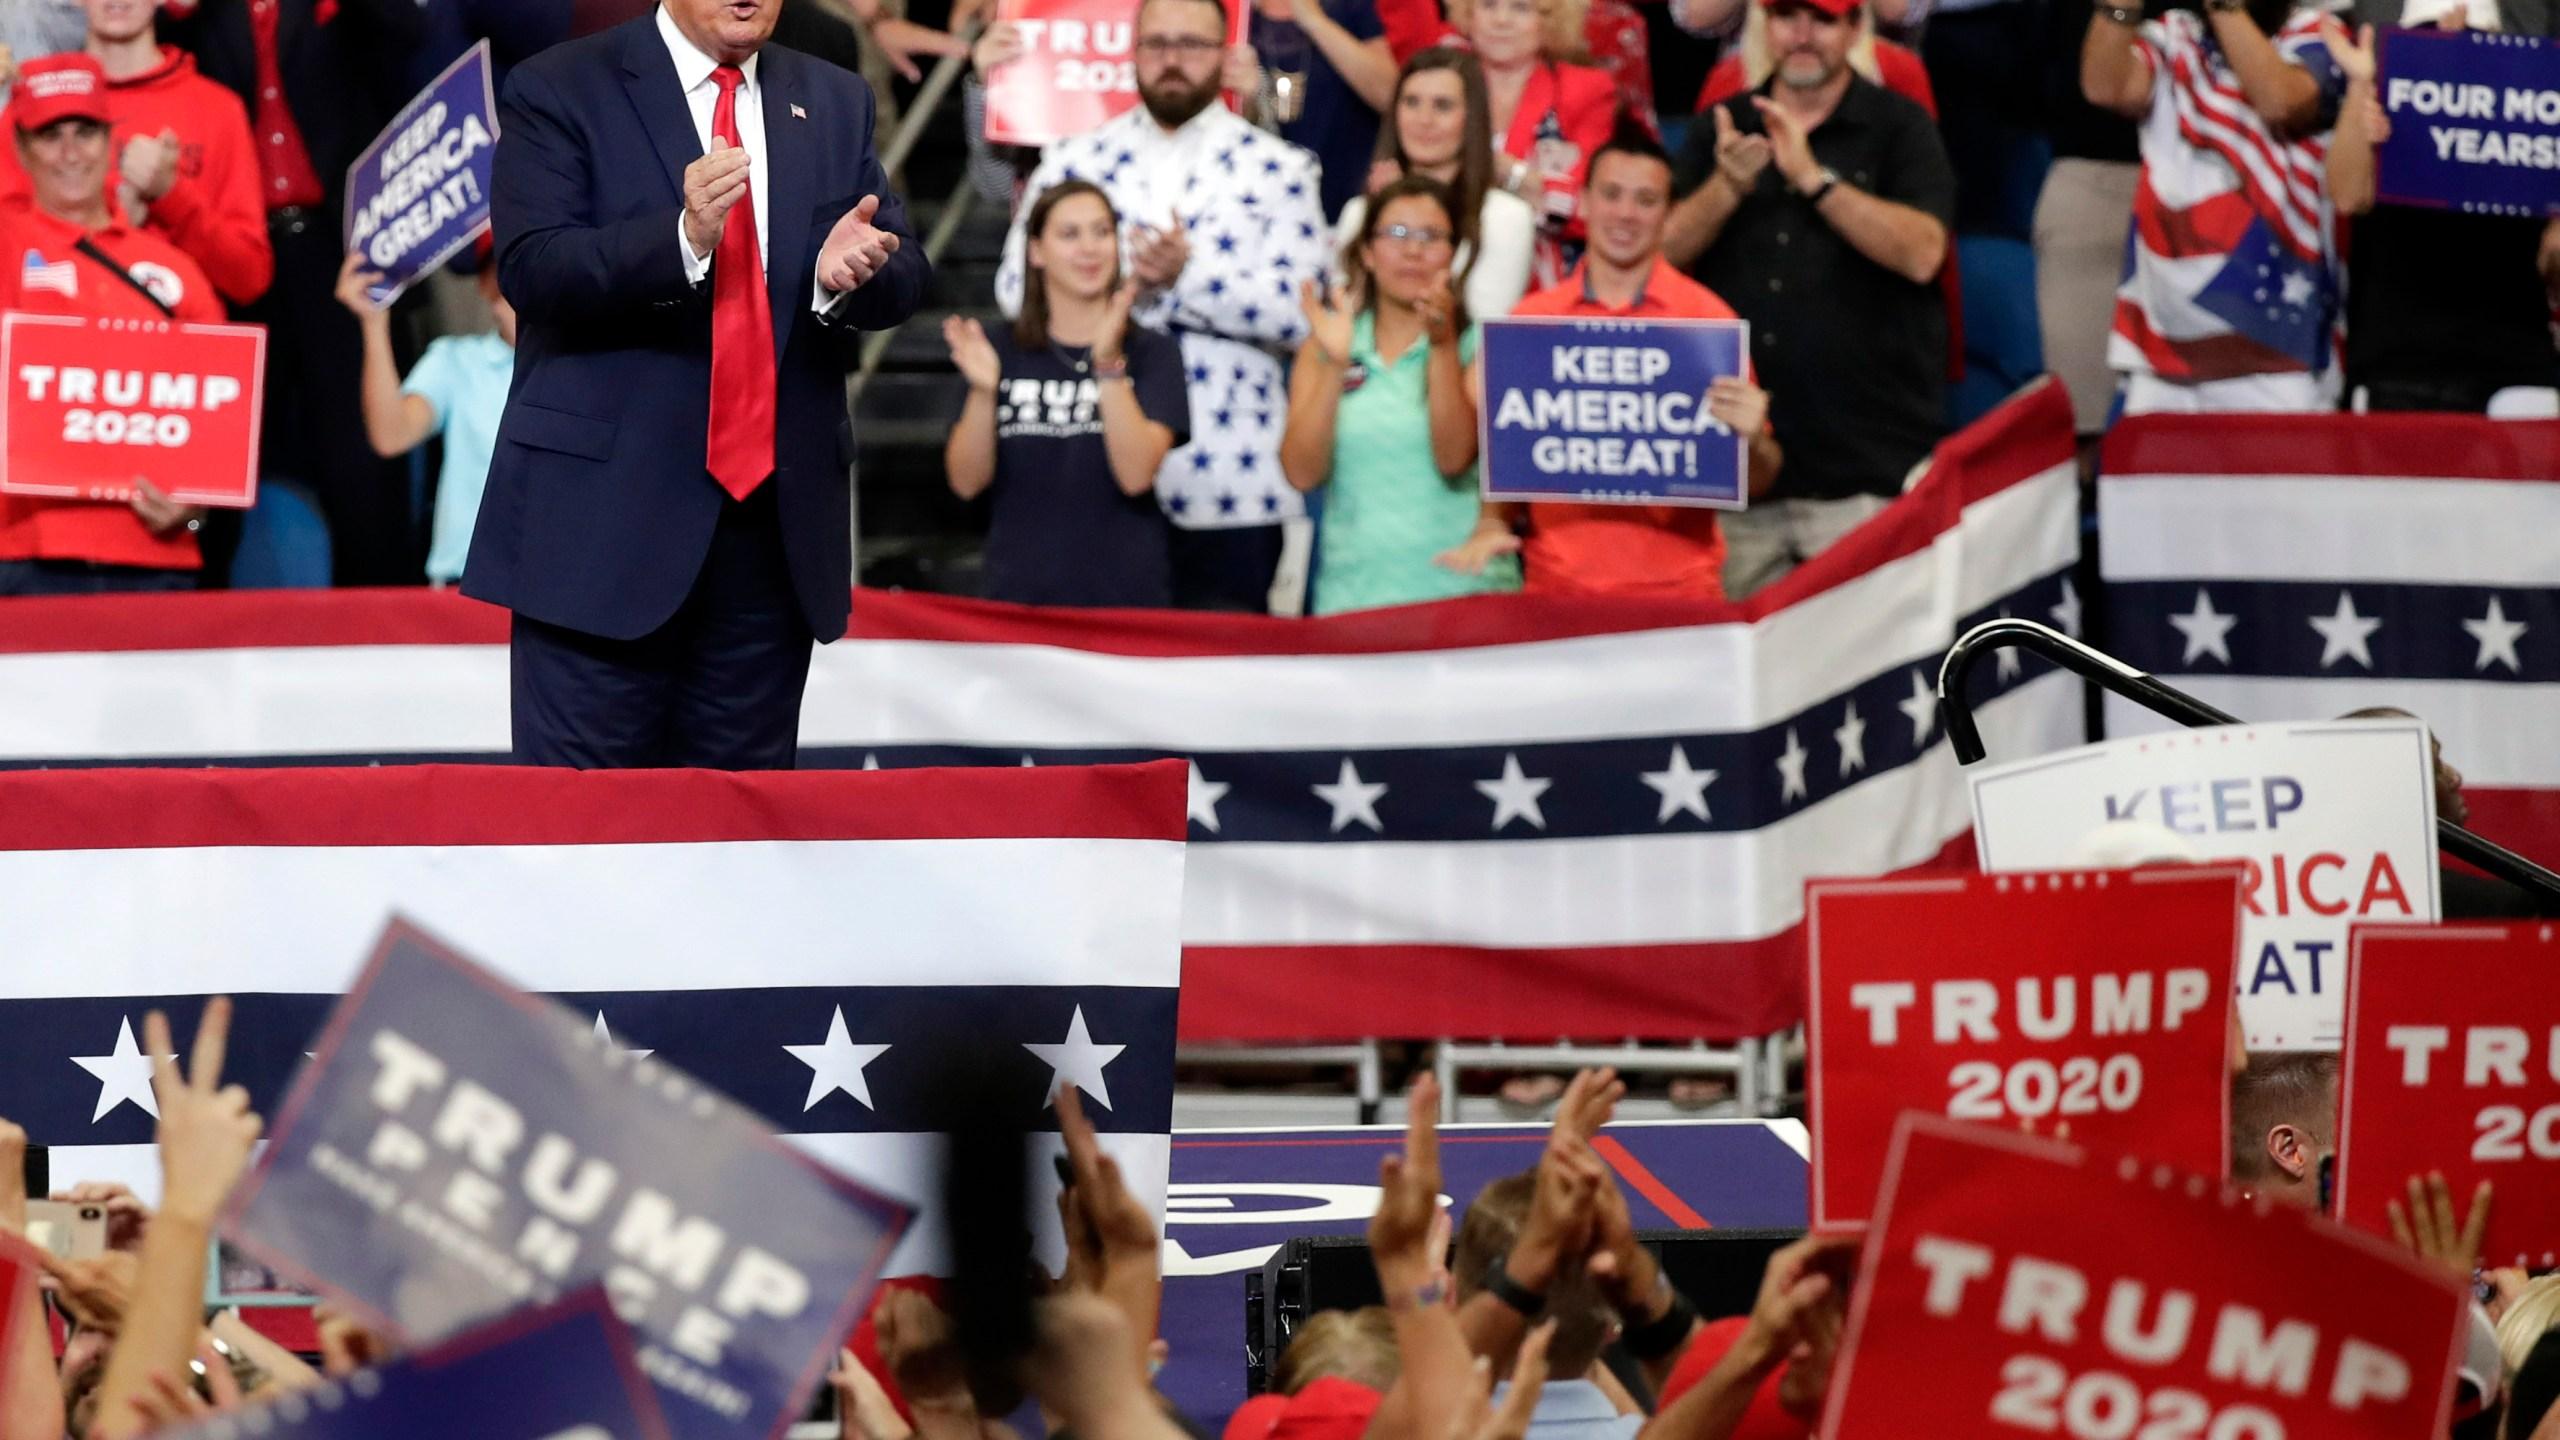 Election_2020_Trump_29769-159532.jpg42421353